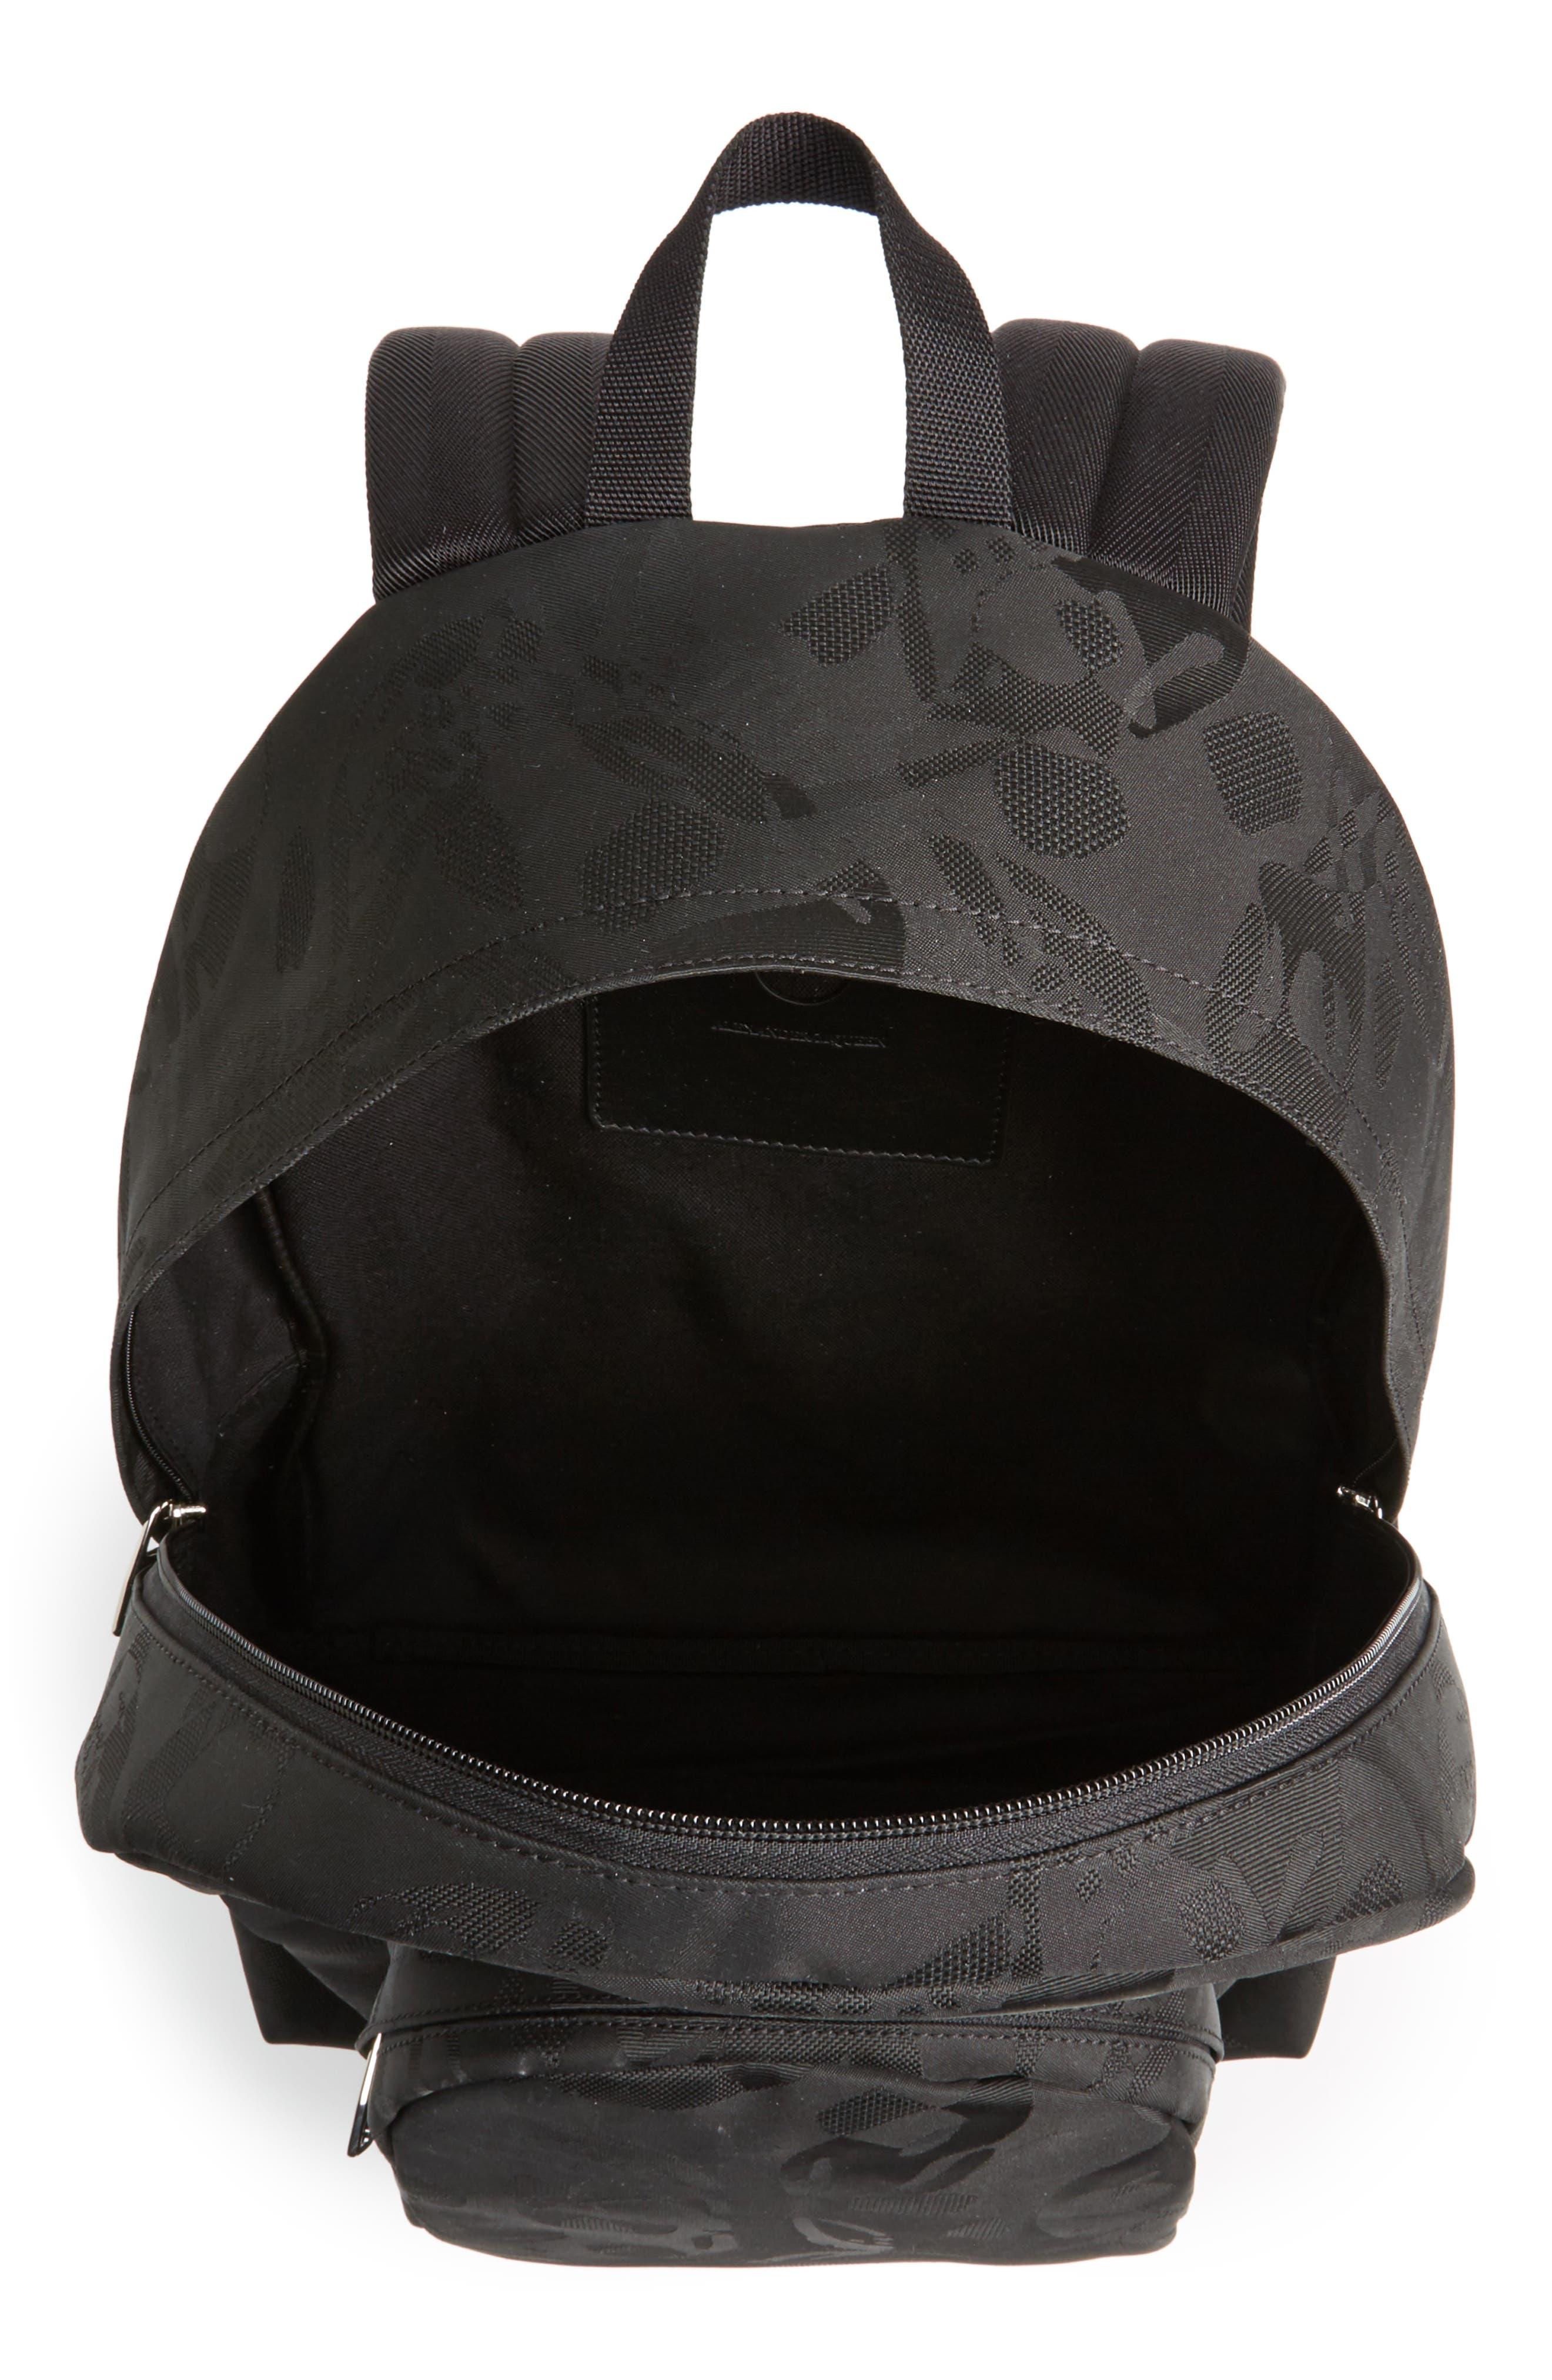 Small Backpack,                             Alternate thumbnail 4, color,                             Black